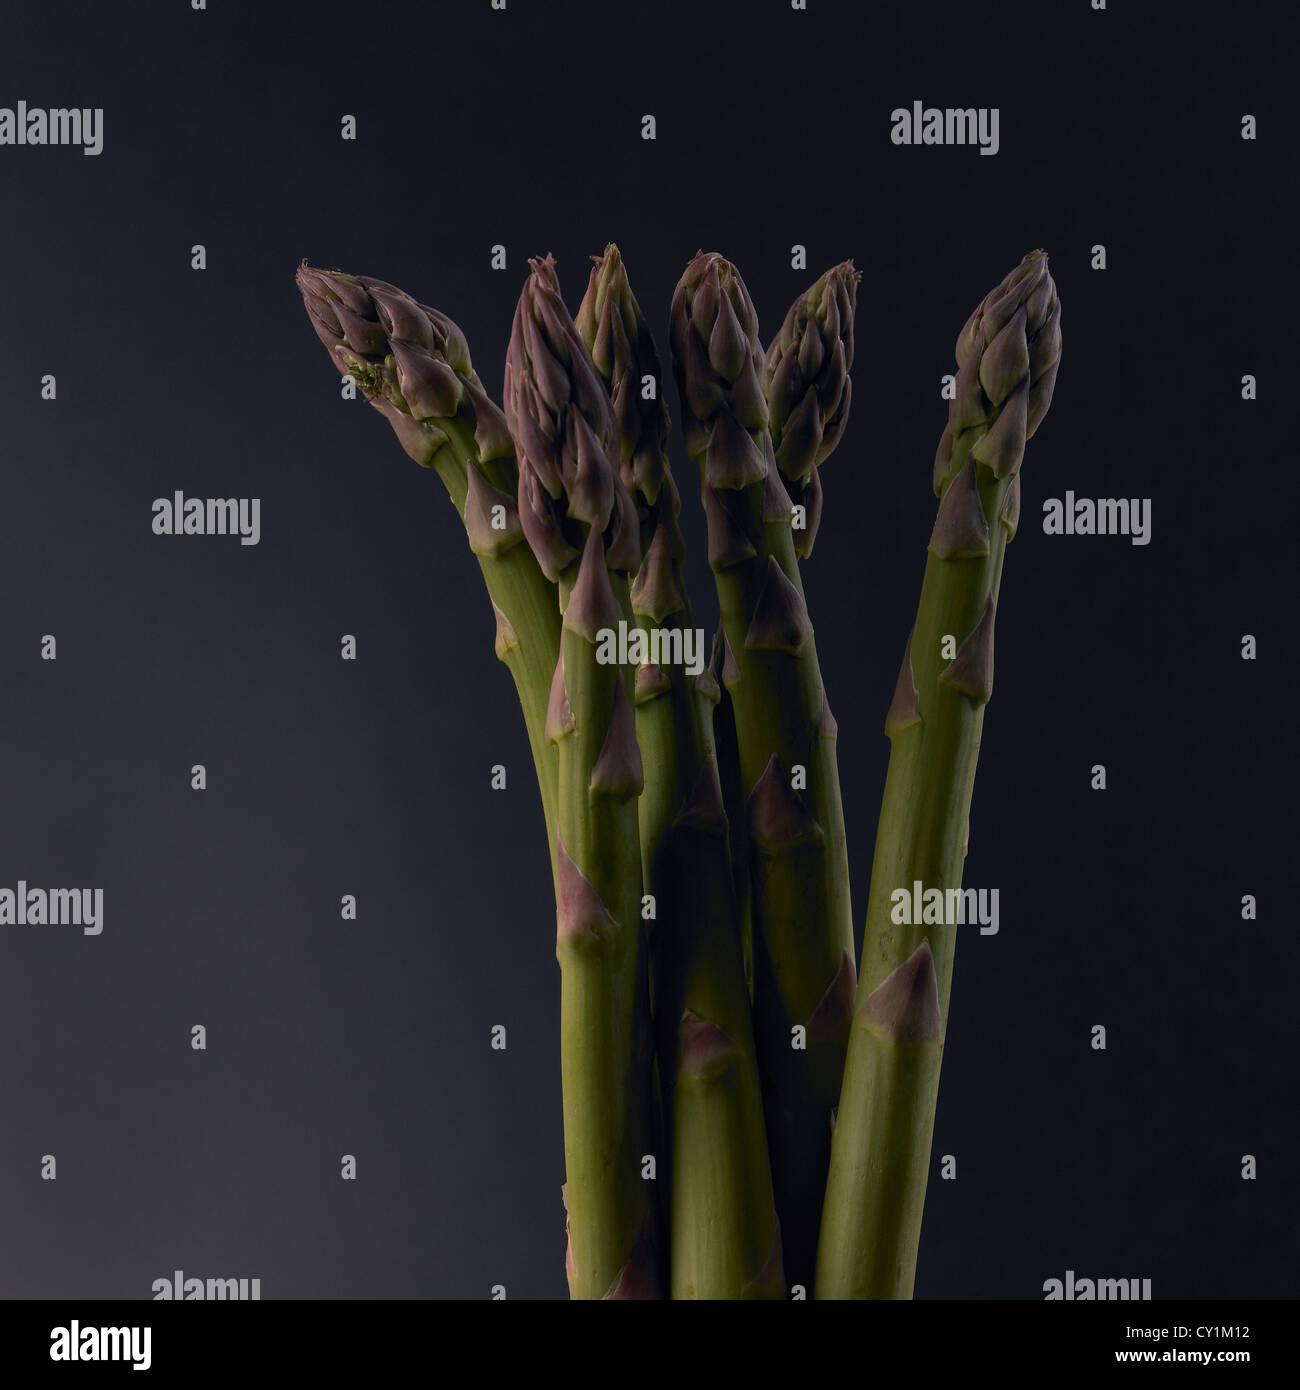 asparagus-spears-on-dark-background-CY1M